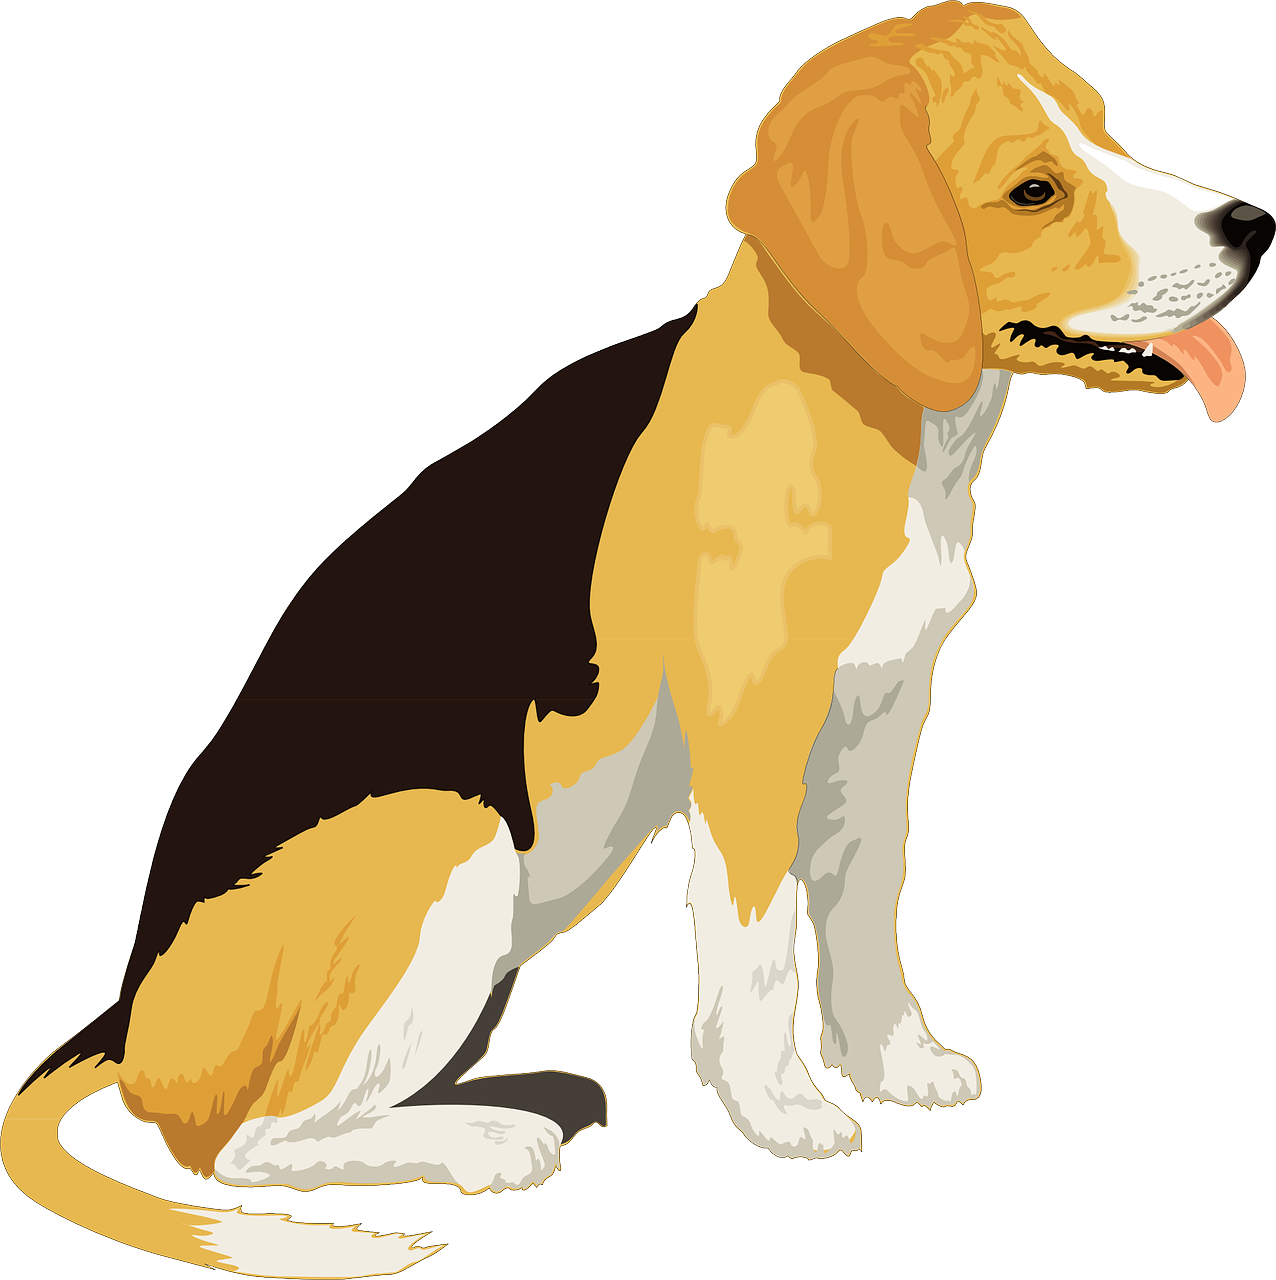 Beagle clipart playful puppy. Black yellow dog pet